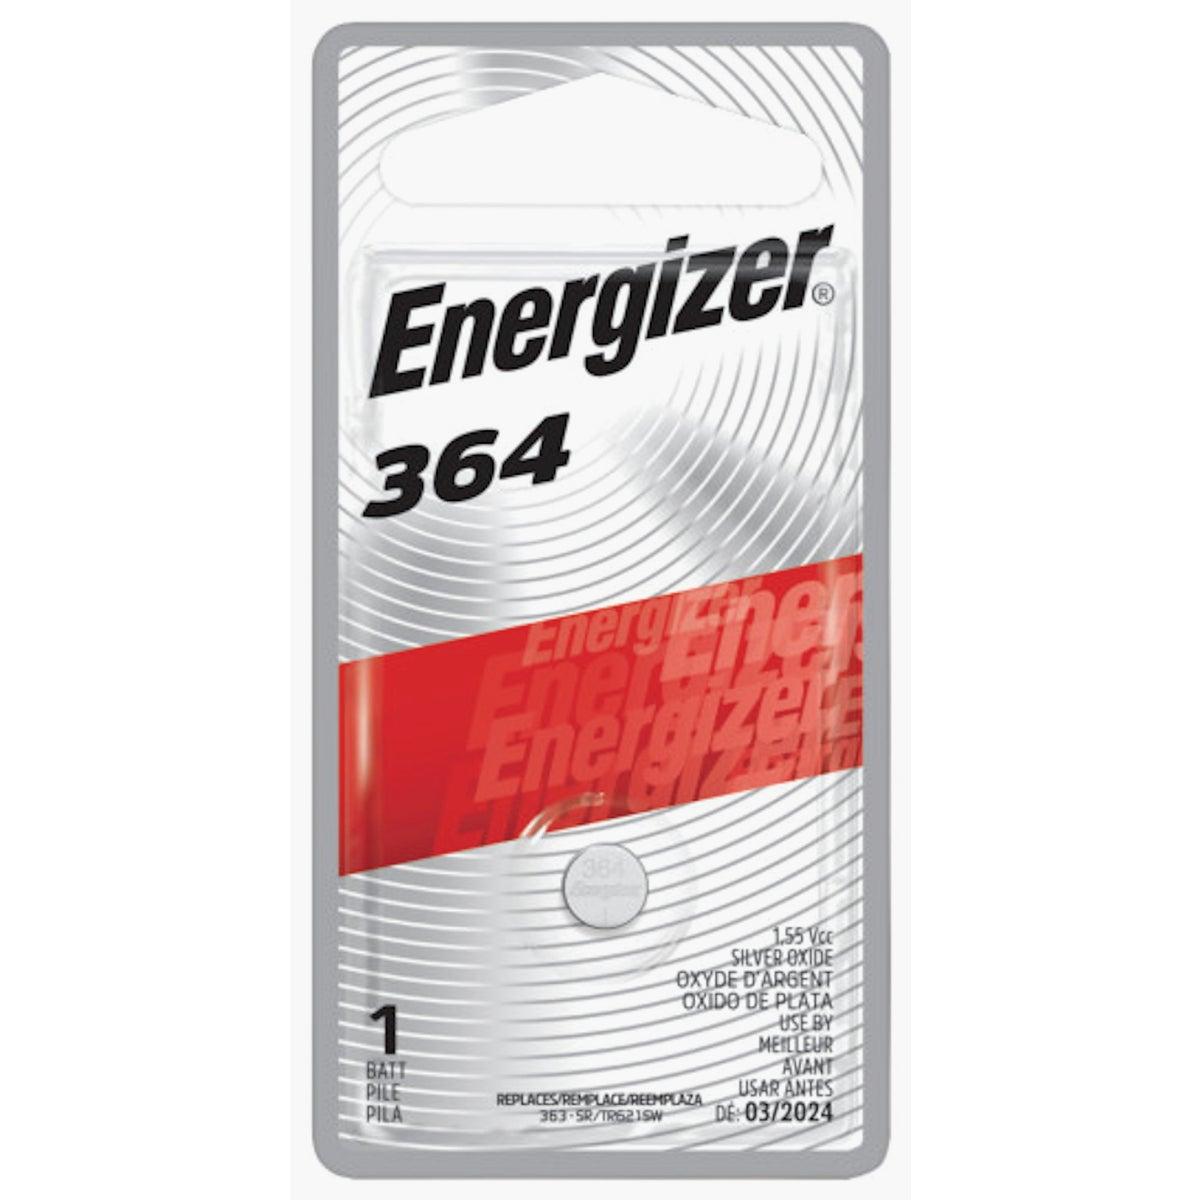 Energizer 1.6V WATCH BATTERY 364BP